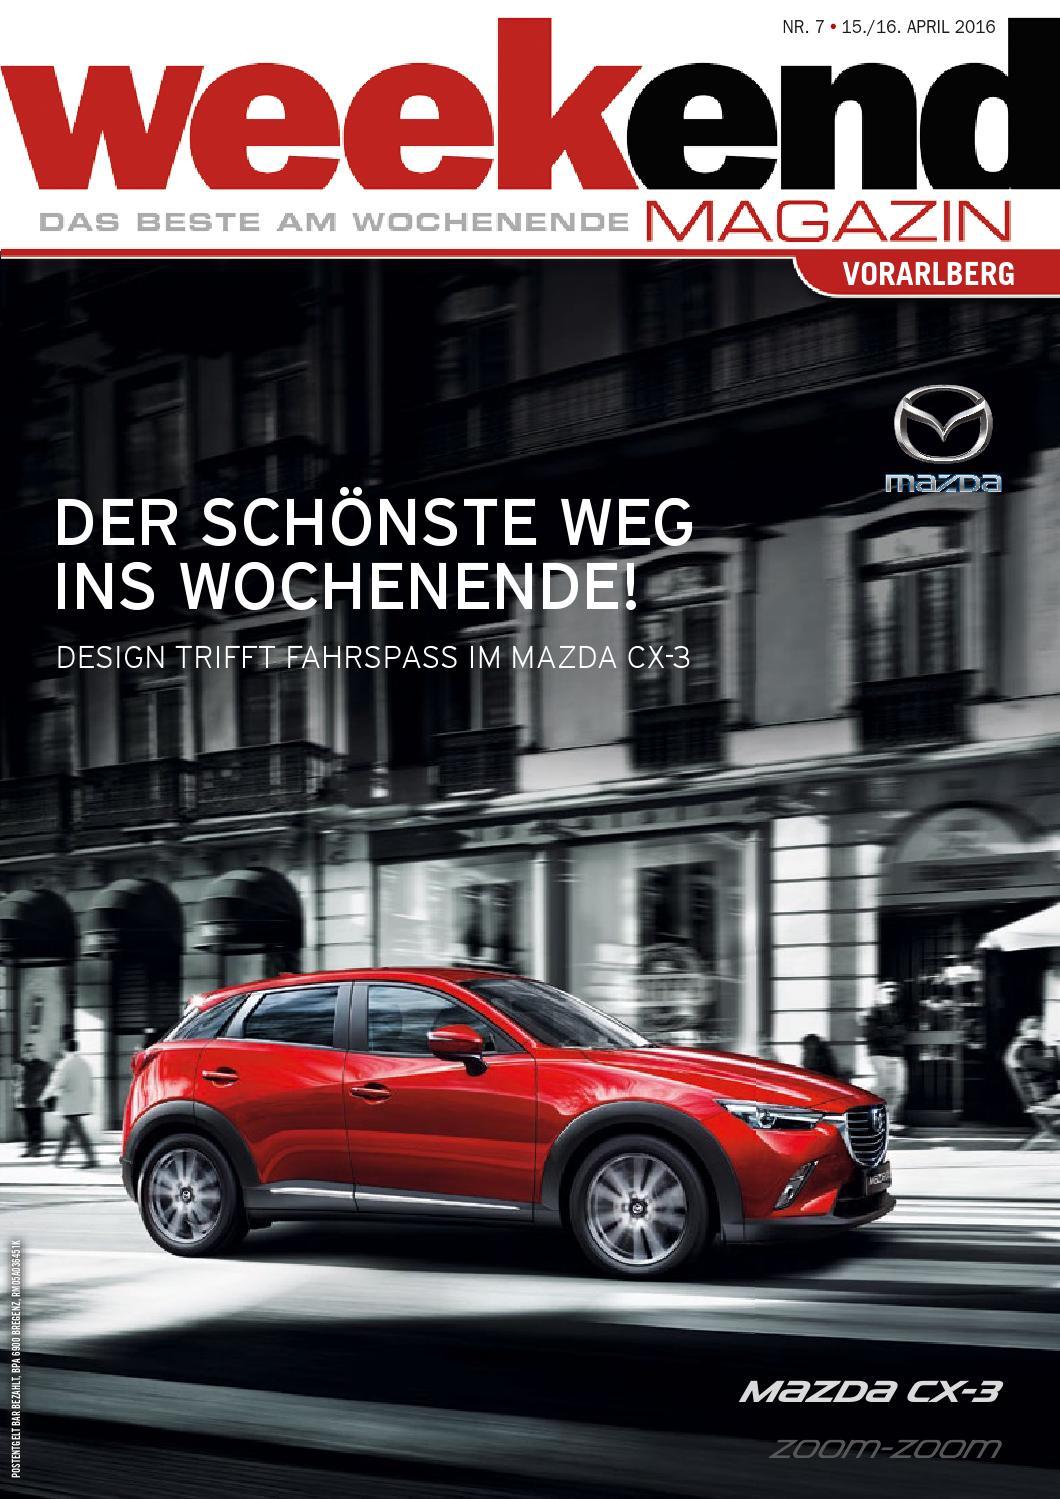 Weekend Magazin Vorarlberg 2016 KW 15 by Weekend Magazin